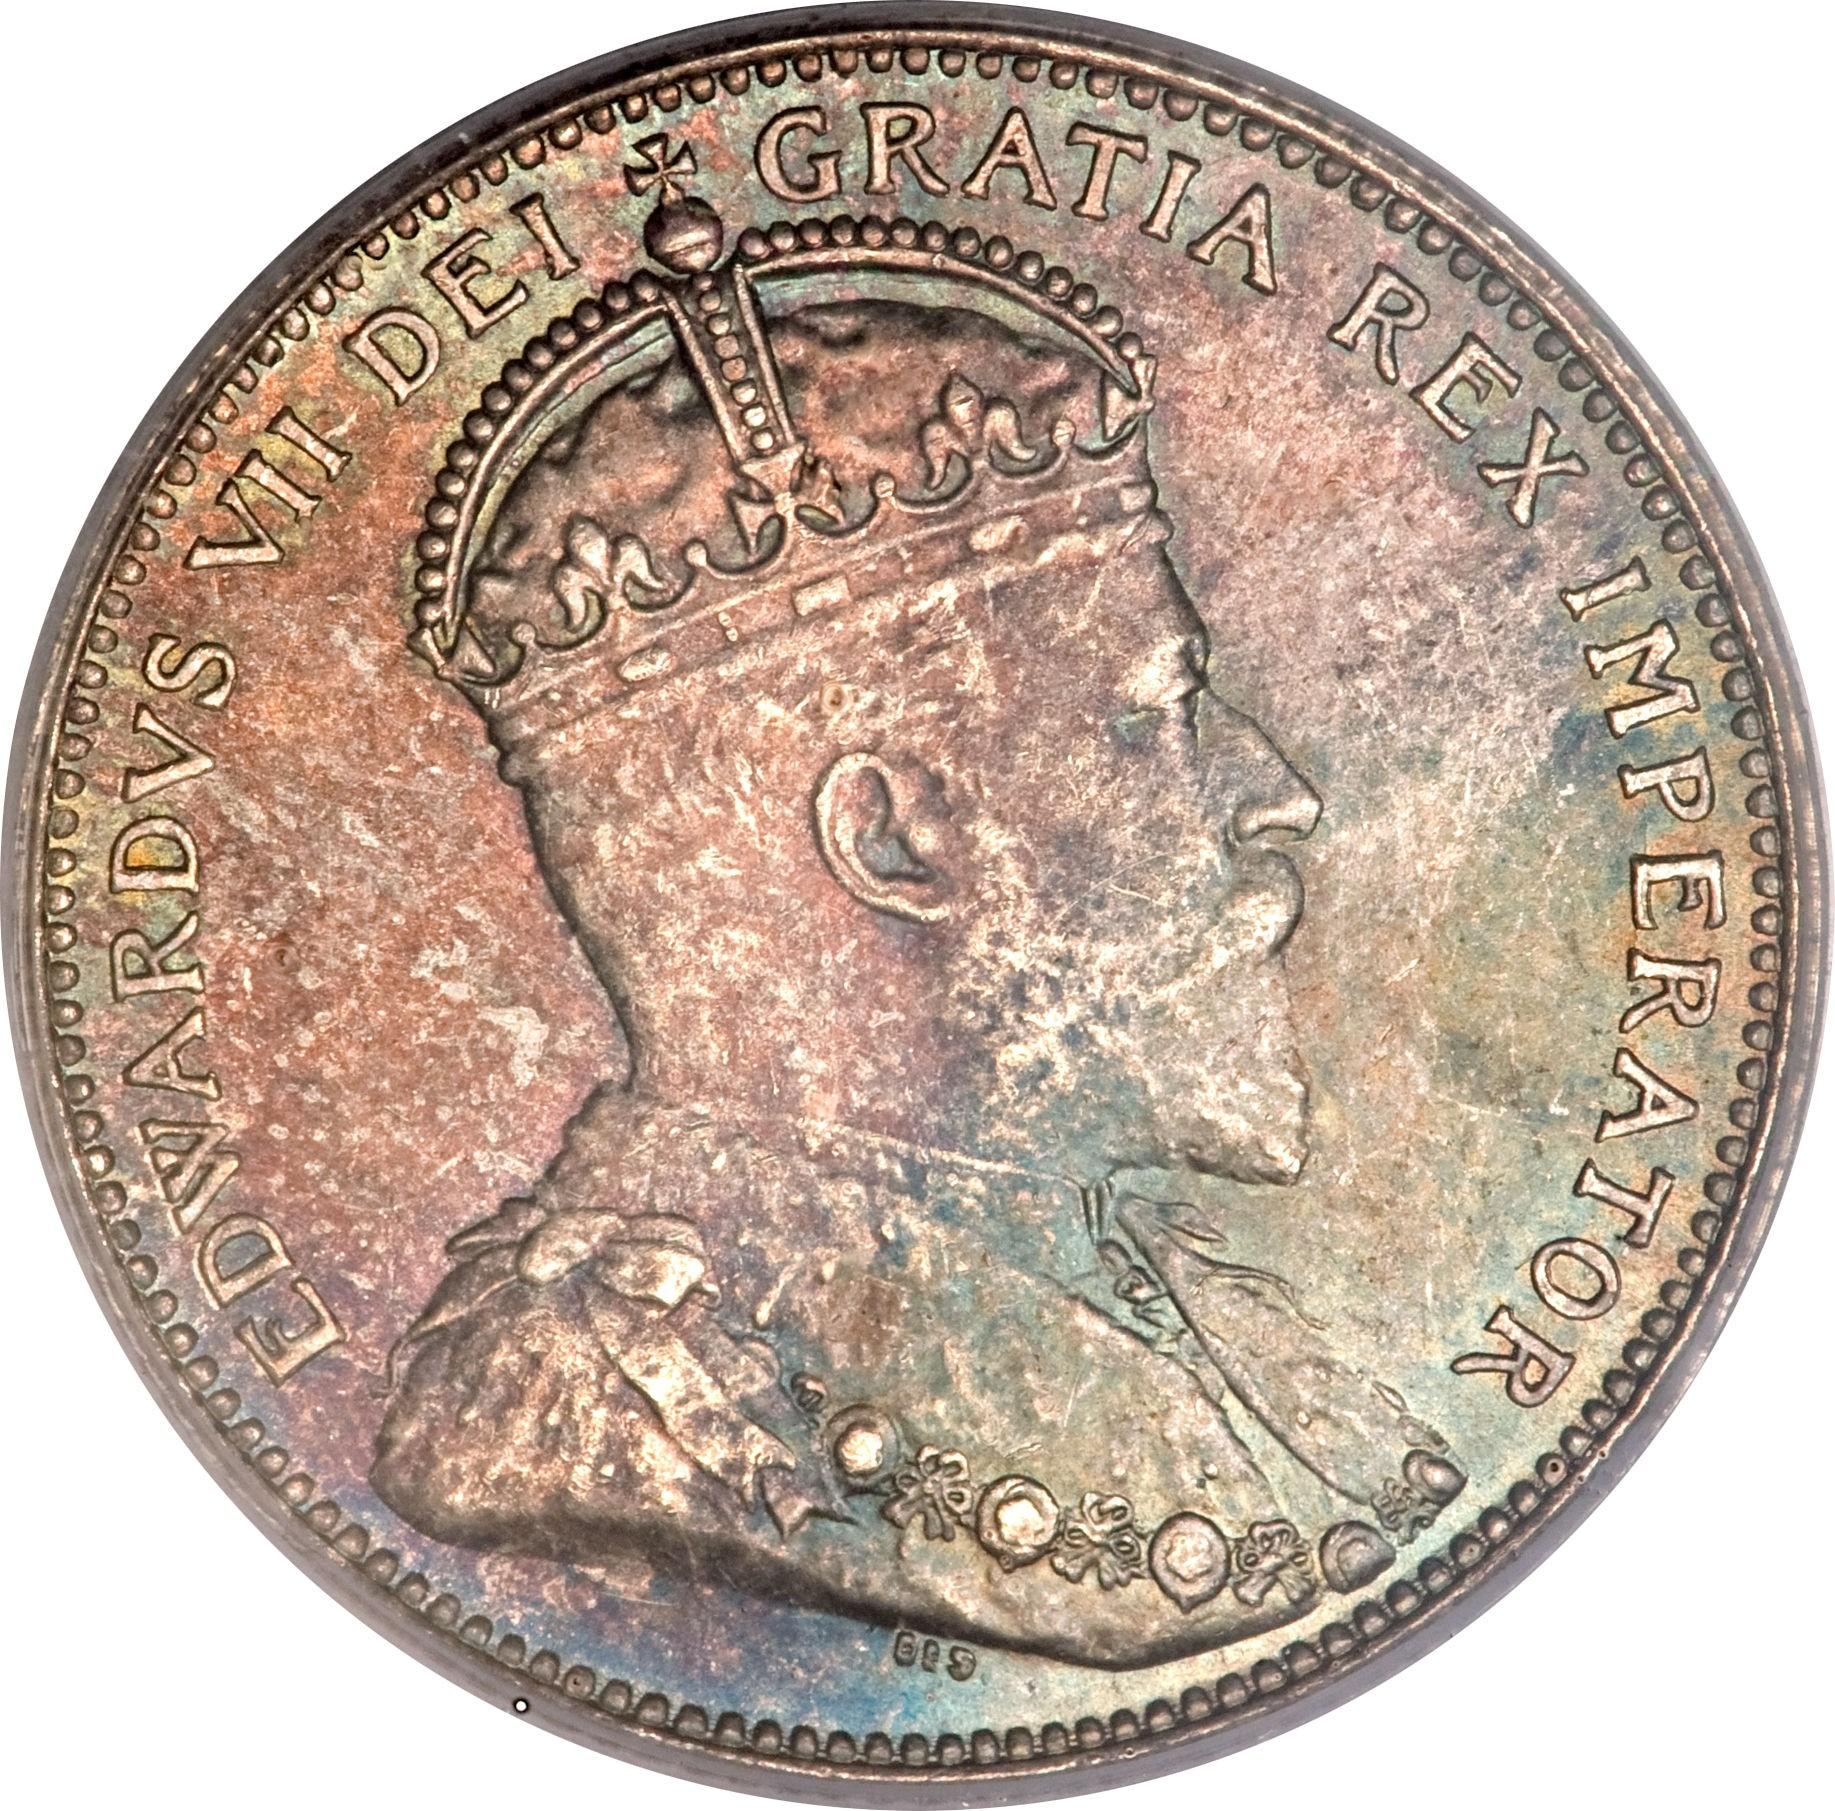 Canada 25 Cents (1910 Edward VII)